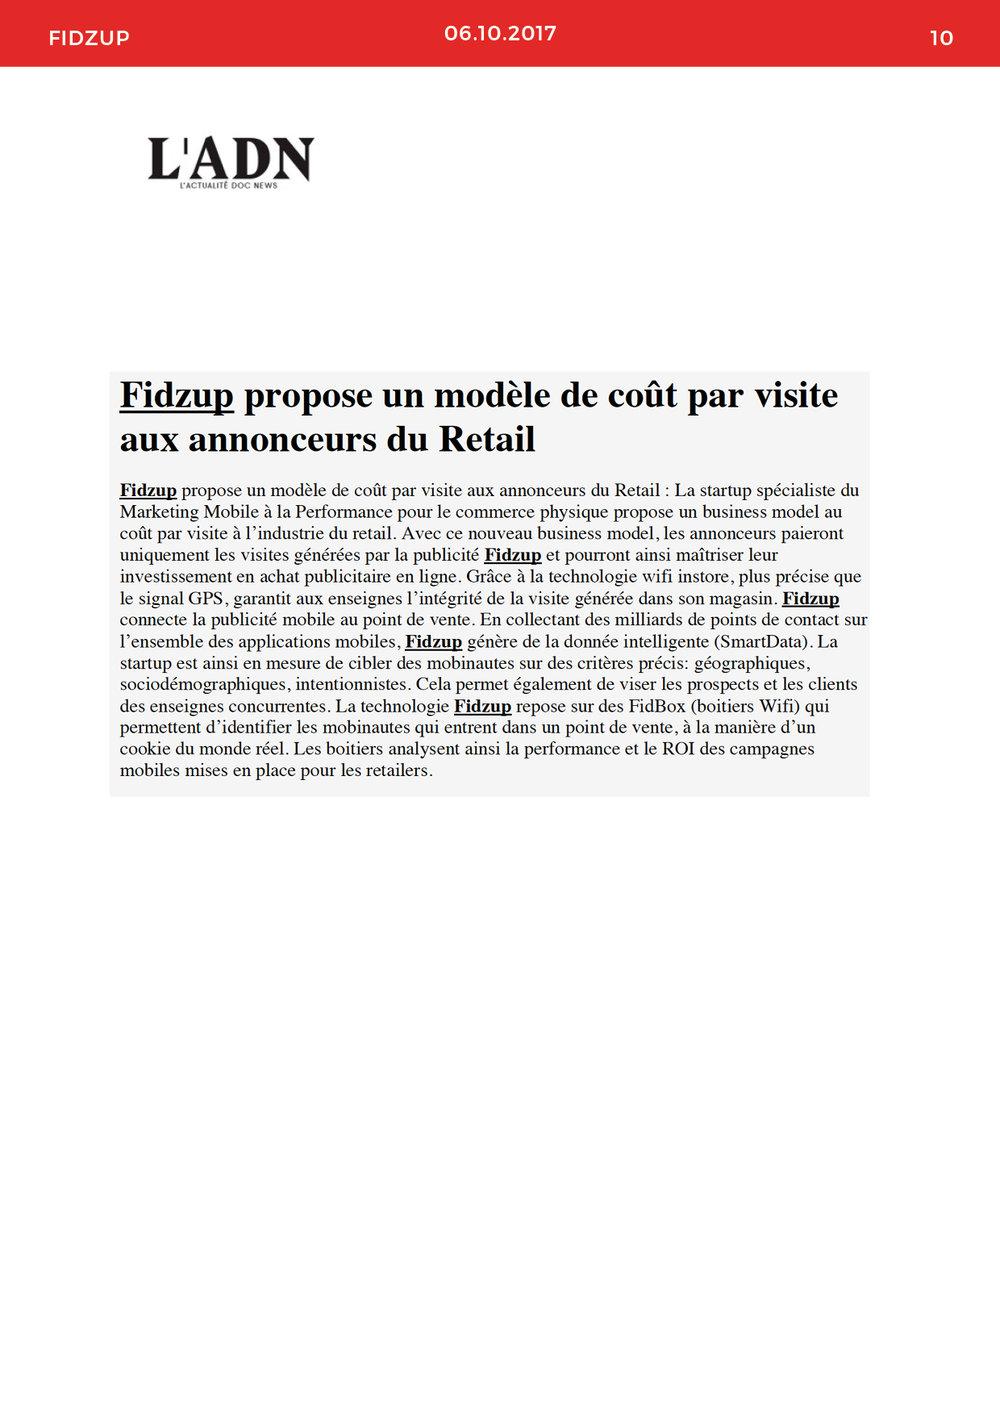 BOOKMEDIA_OCT_010.jpg